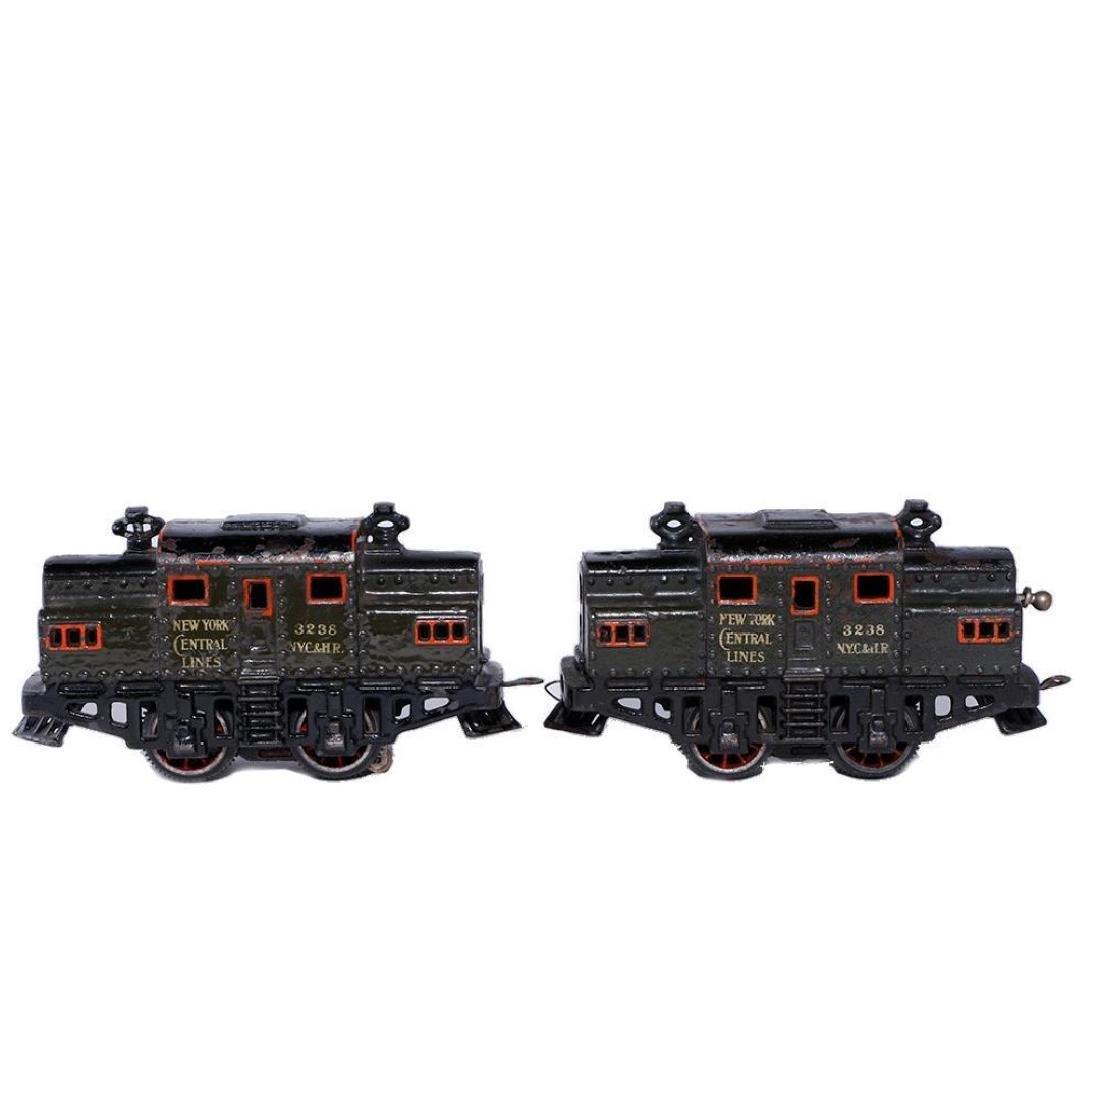 Two Bing 0 Gauge Cast Iron Electric NYC Type Locomotive